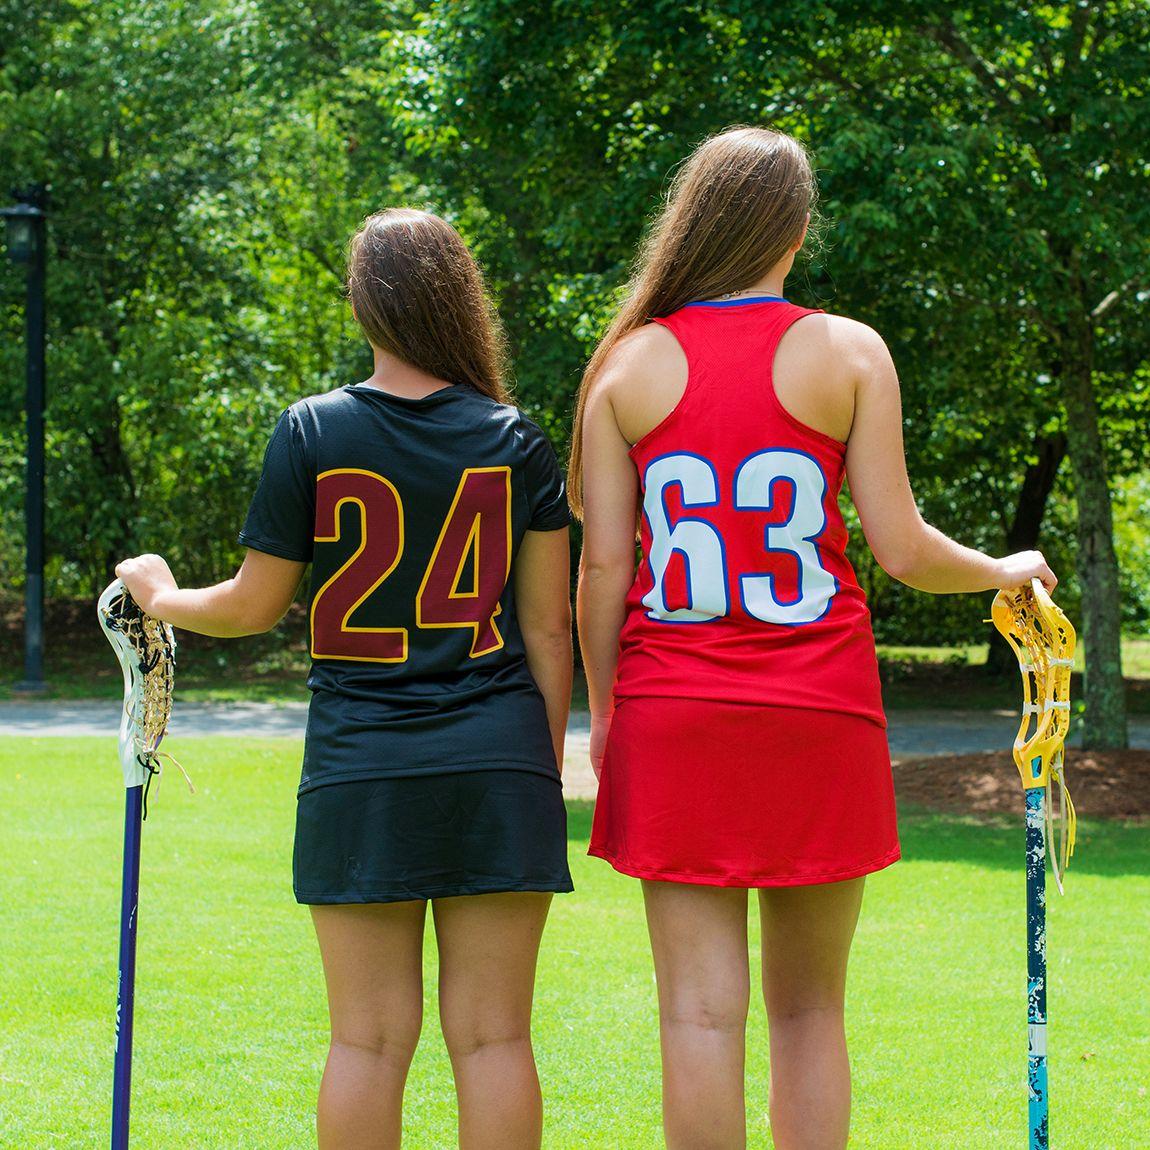 37b5ac6e2fc Sportabella - Women s Lacrosse Custom Teamwear - Women s Under Armour  Uniforms Available - Call 1-800-SP-BELLA or go to Sportabella.com to  request a quote ...